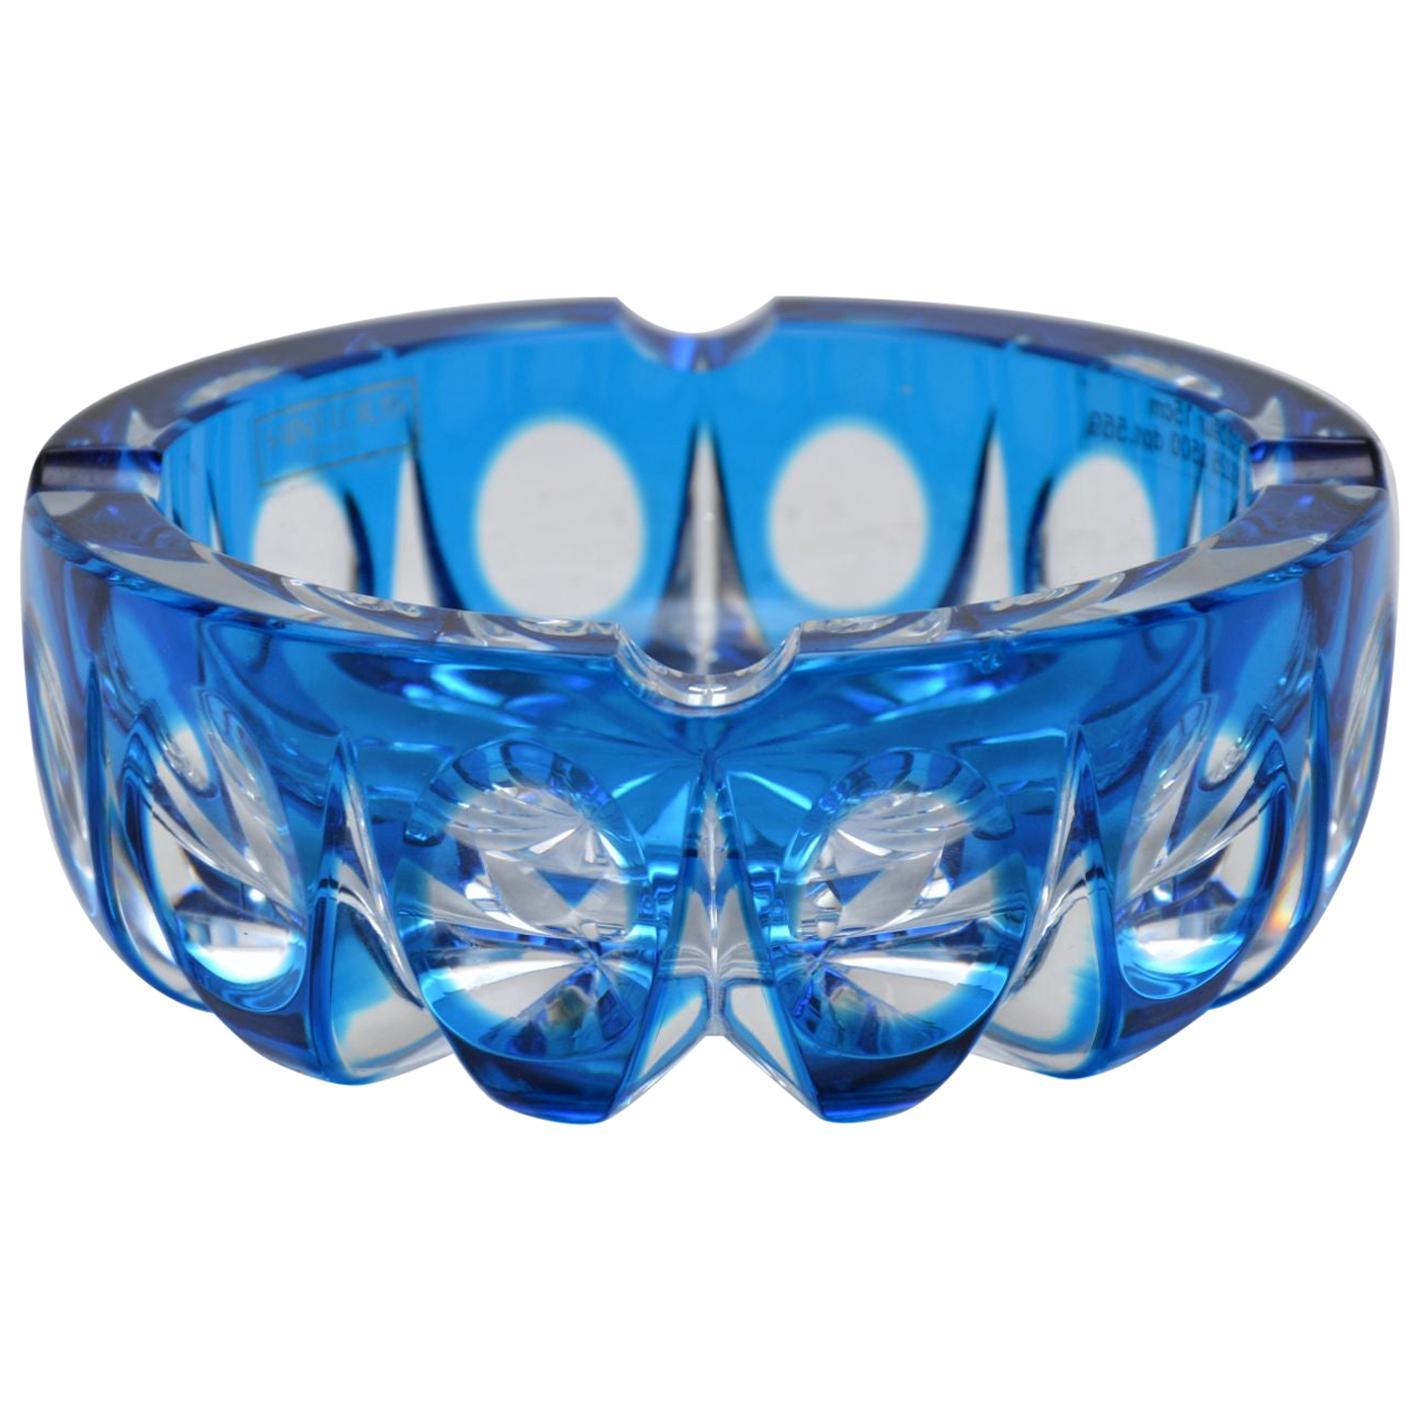 Vintage Crystal Glass Ambassador Ash Tray by Saint Louis